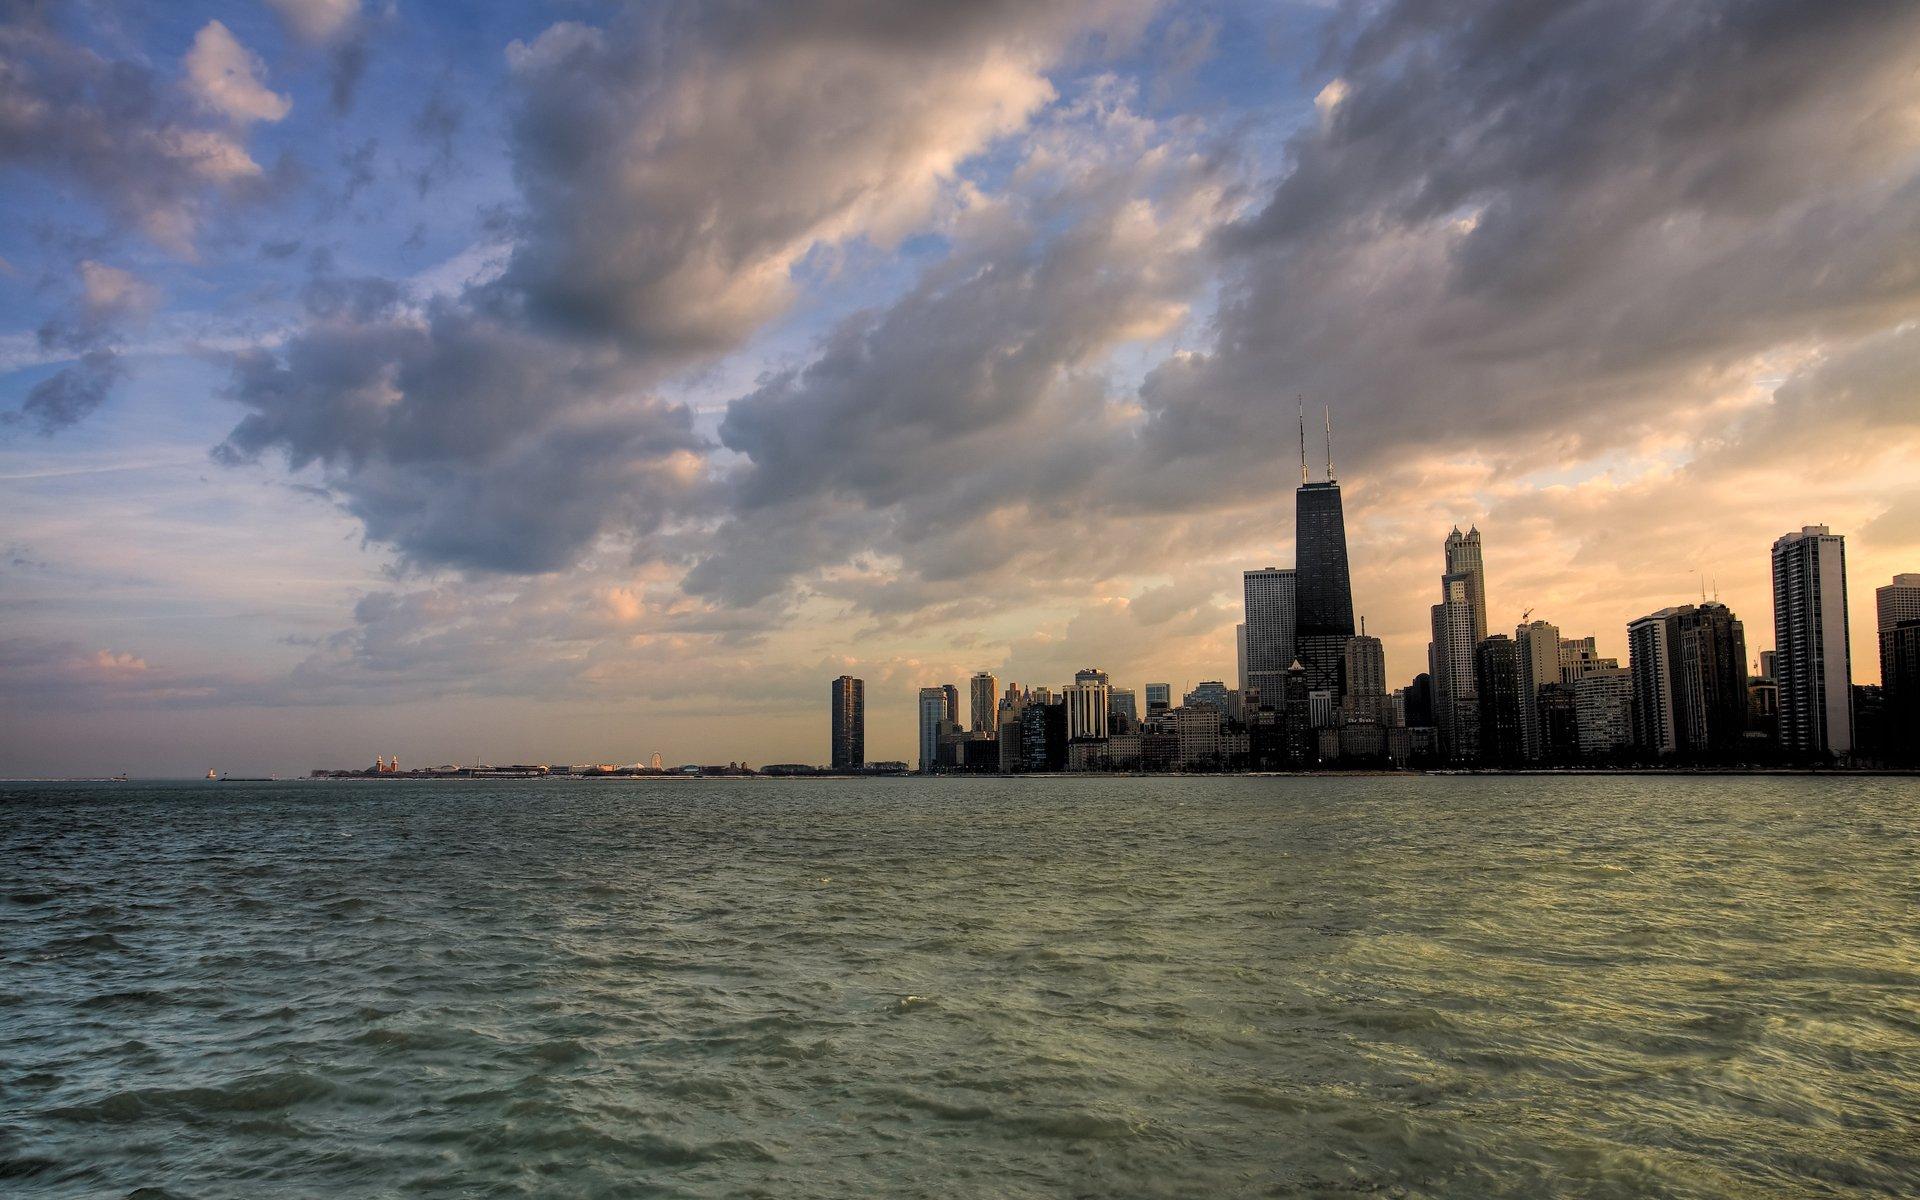 Chicago Skyline Winter Wallpaper Desktop - WallpaperSafari